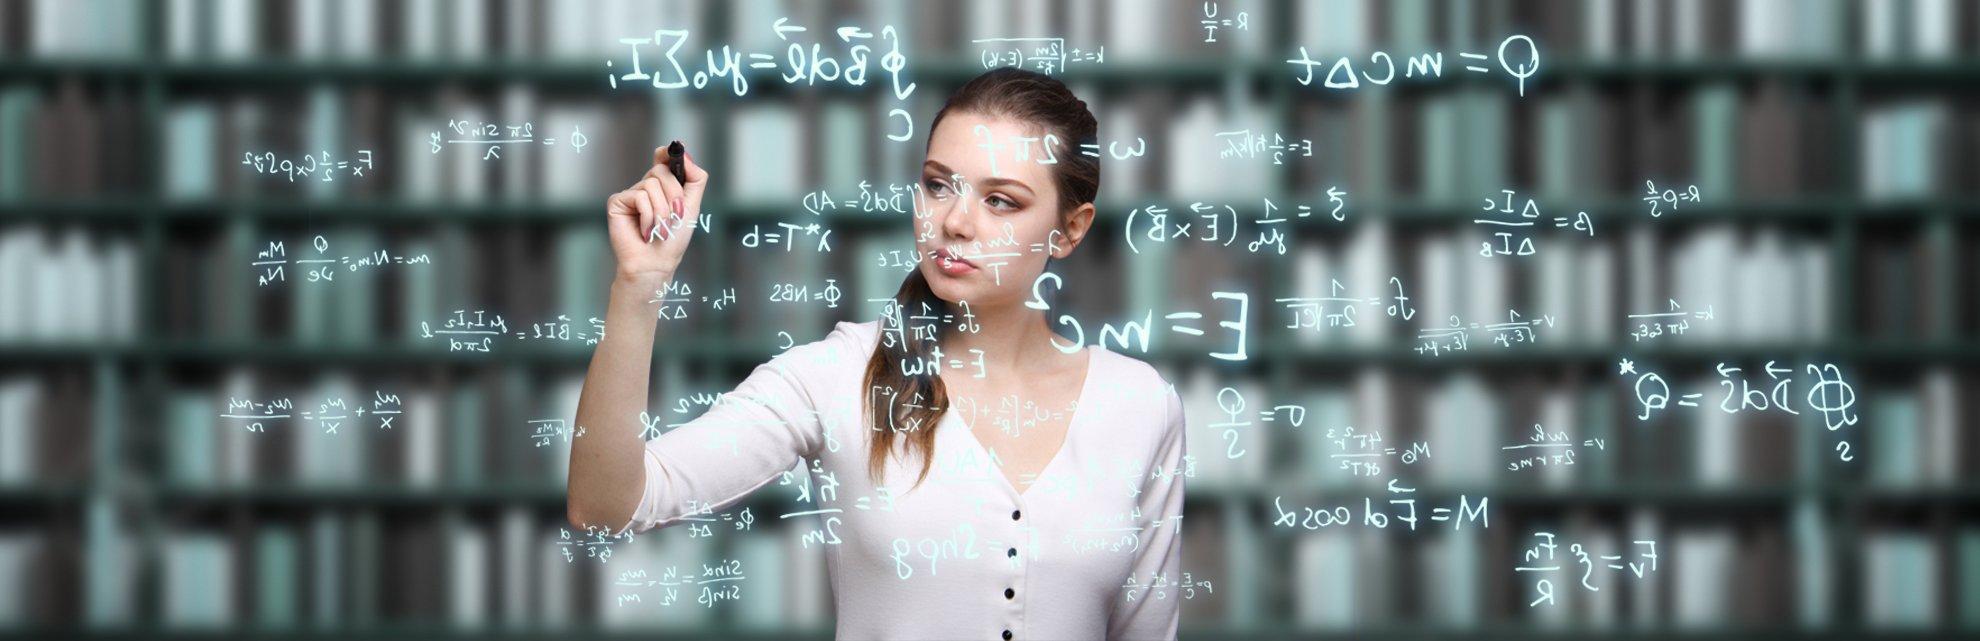 STEM Education Resource - Top Banner: Mathematics